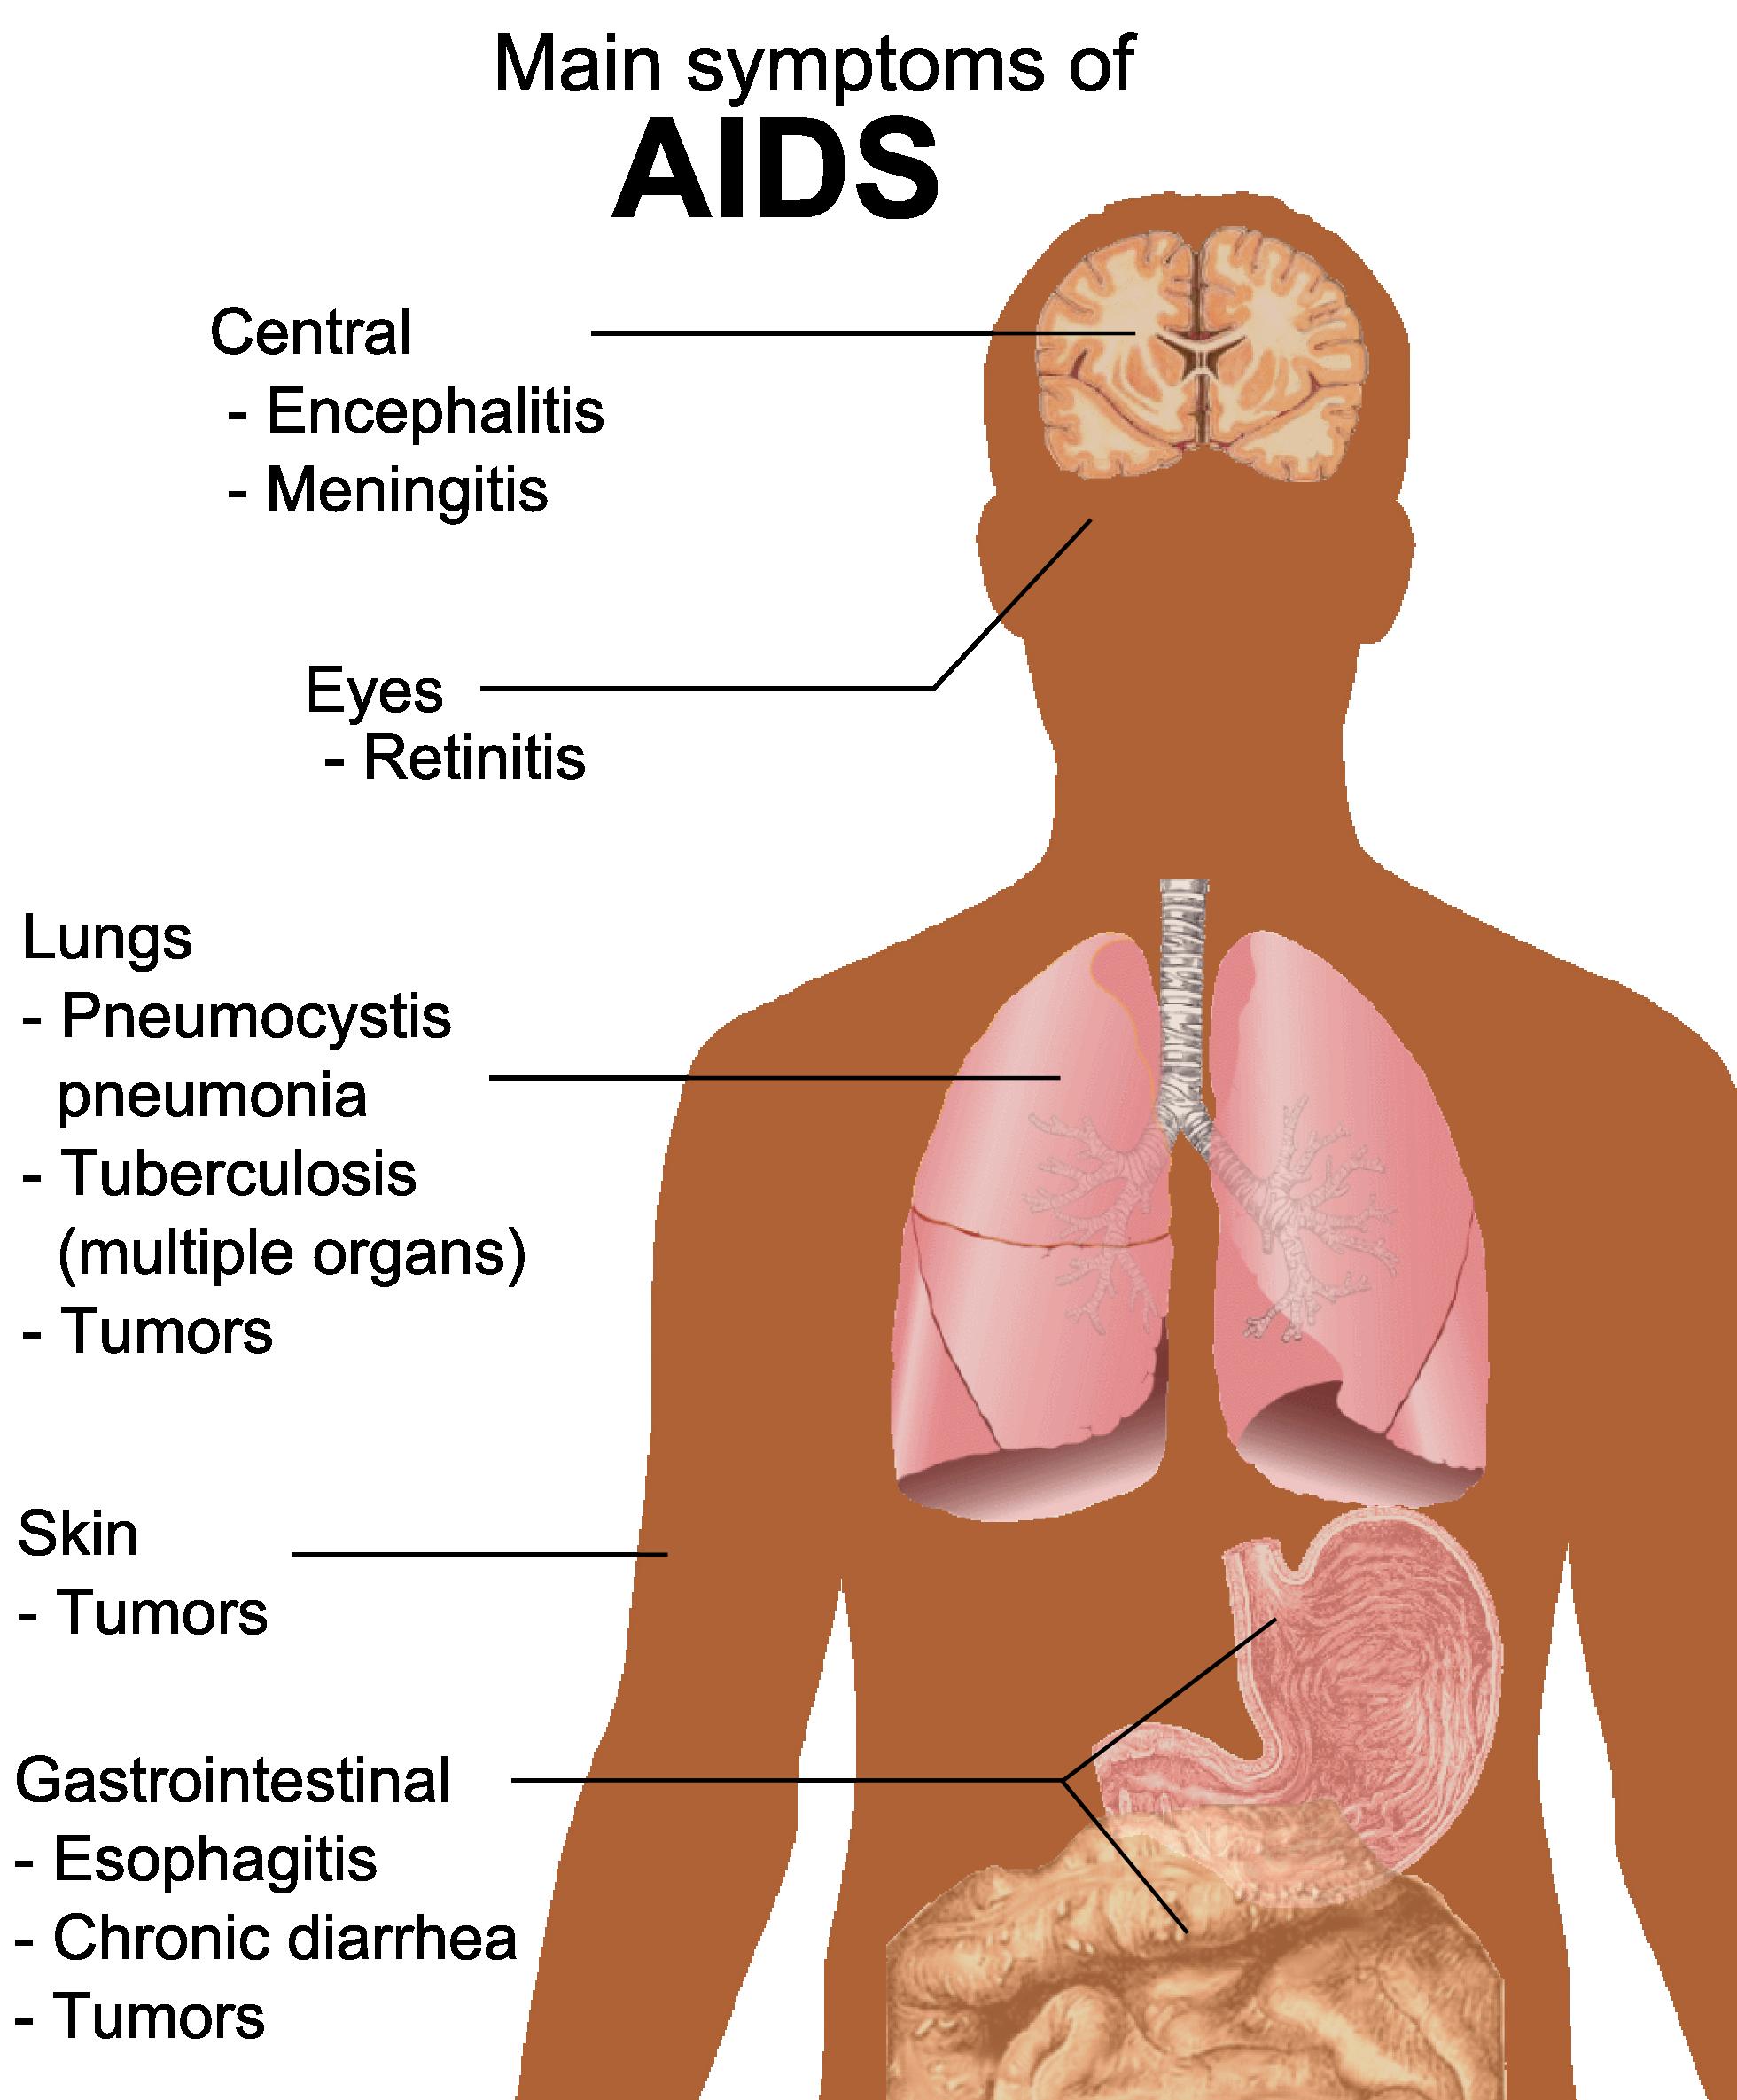 بالصور مرض الحصبة , اعراض الاصابه بمرض الحصبه 6271 1